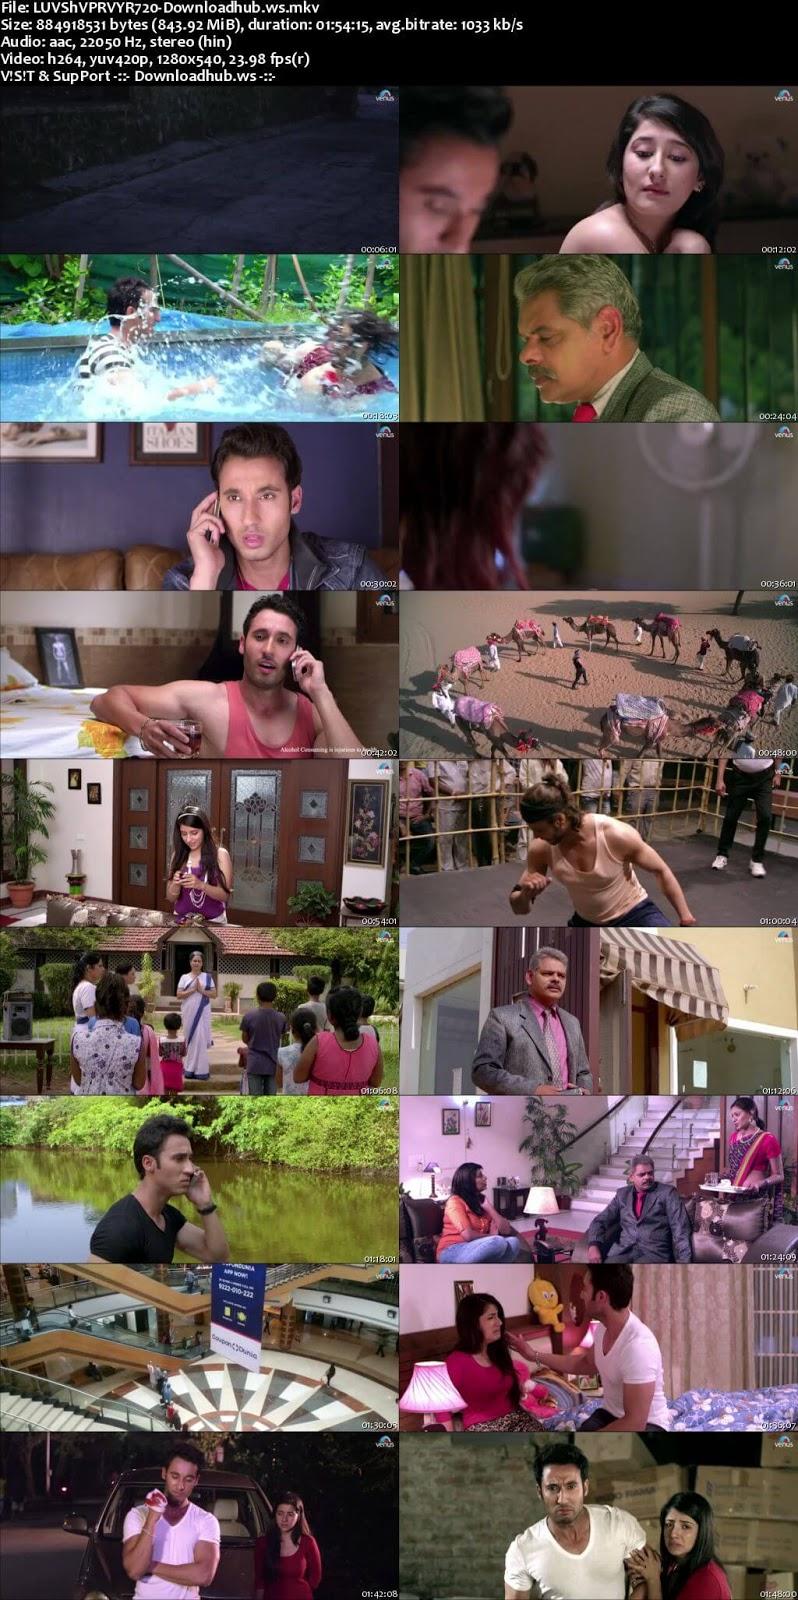 Luv Shuv Pyar Vyar 2017 Hindi 720p HDRip